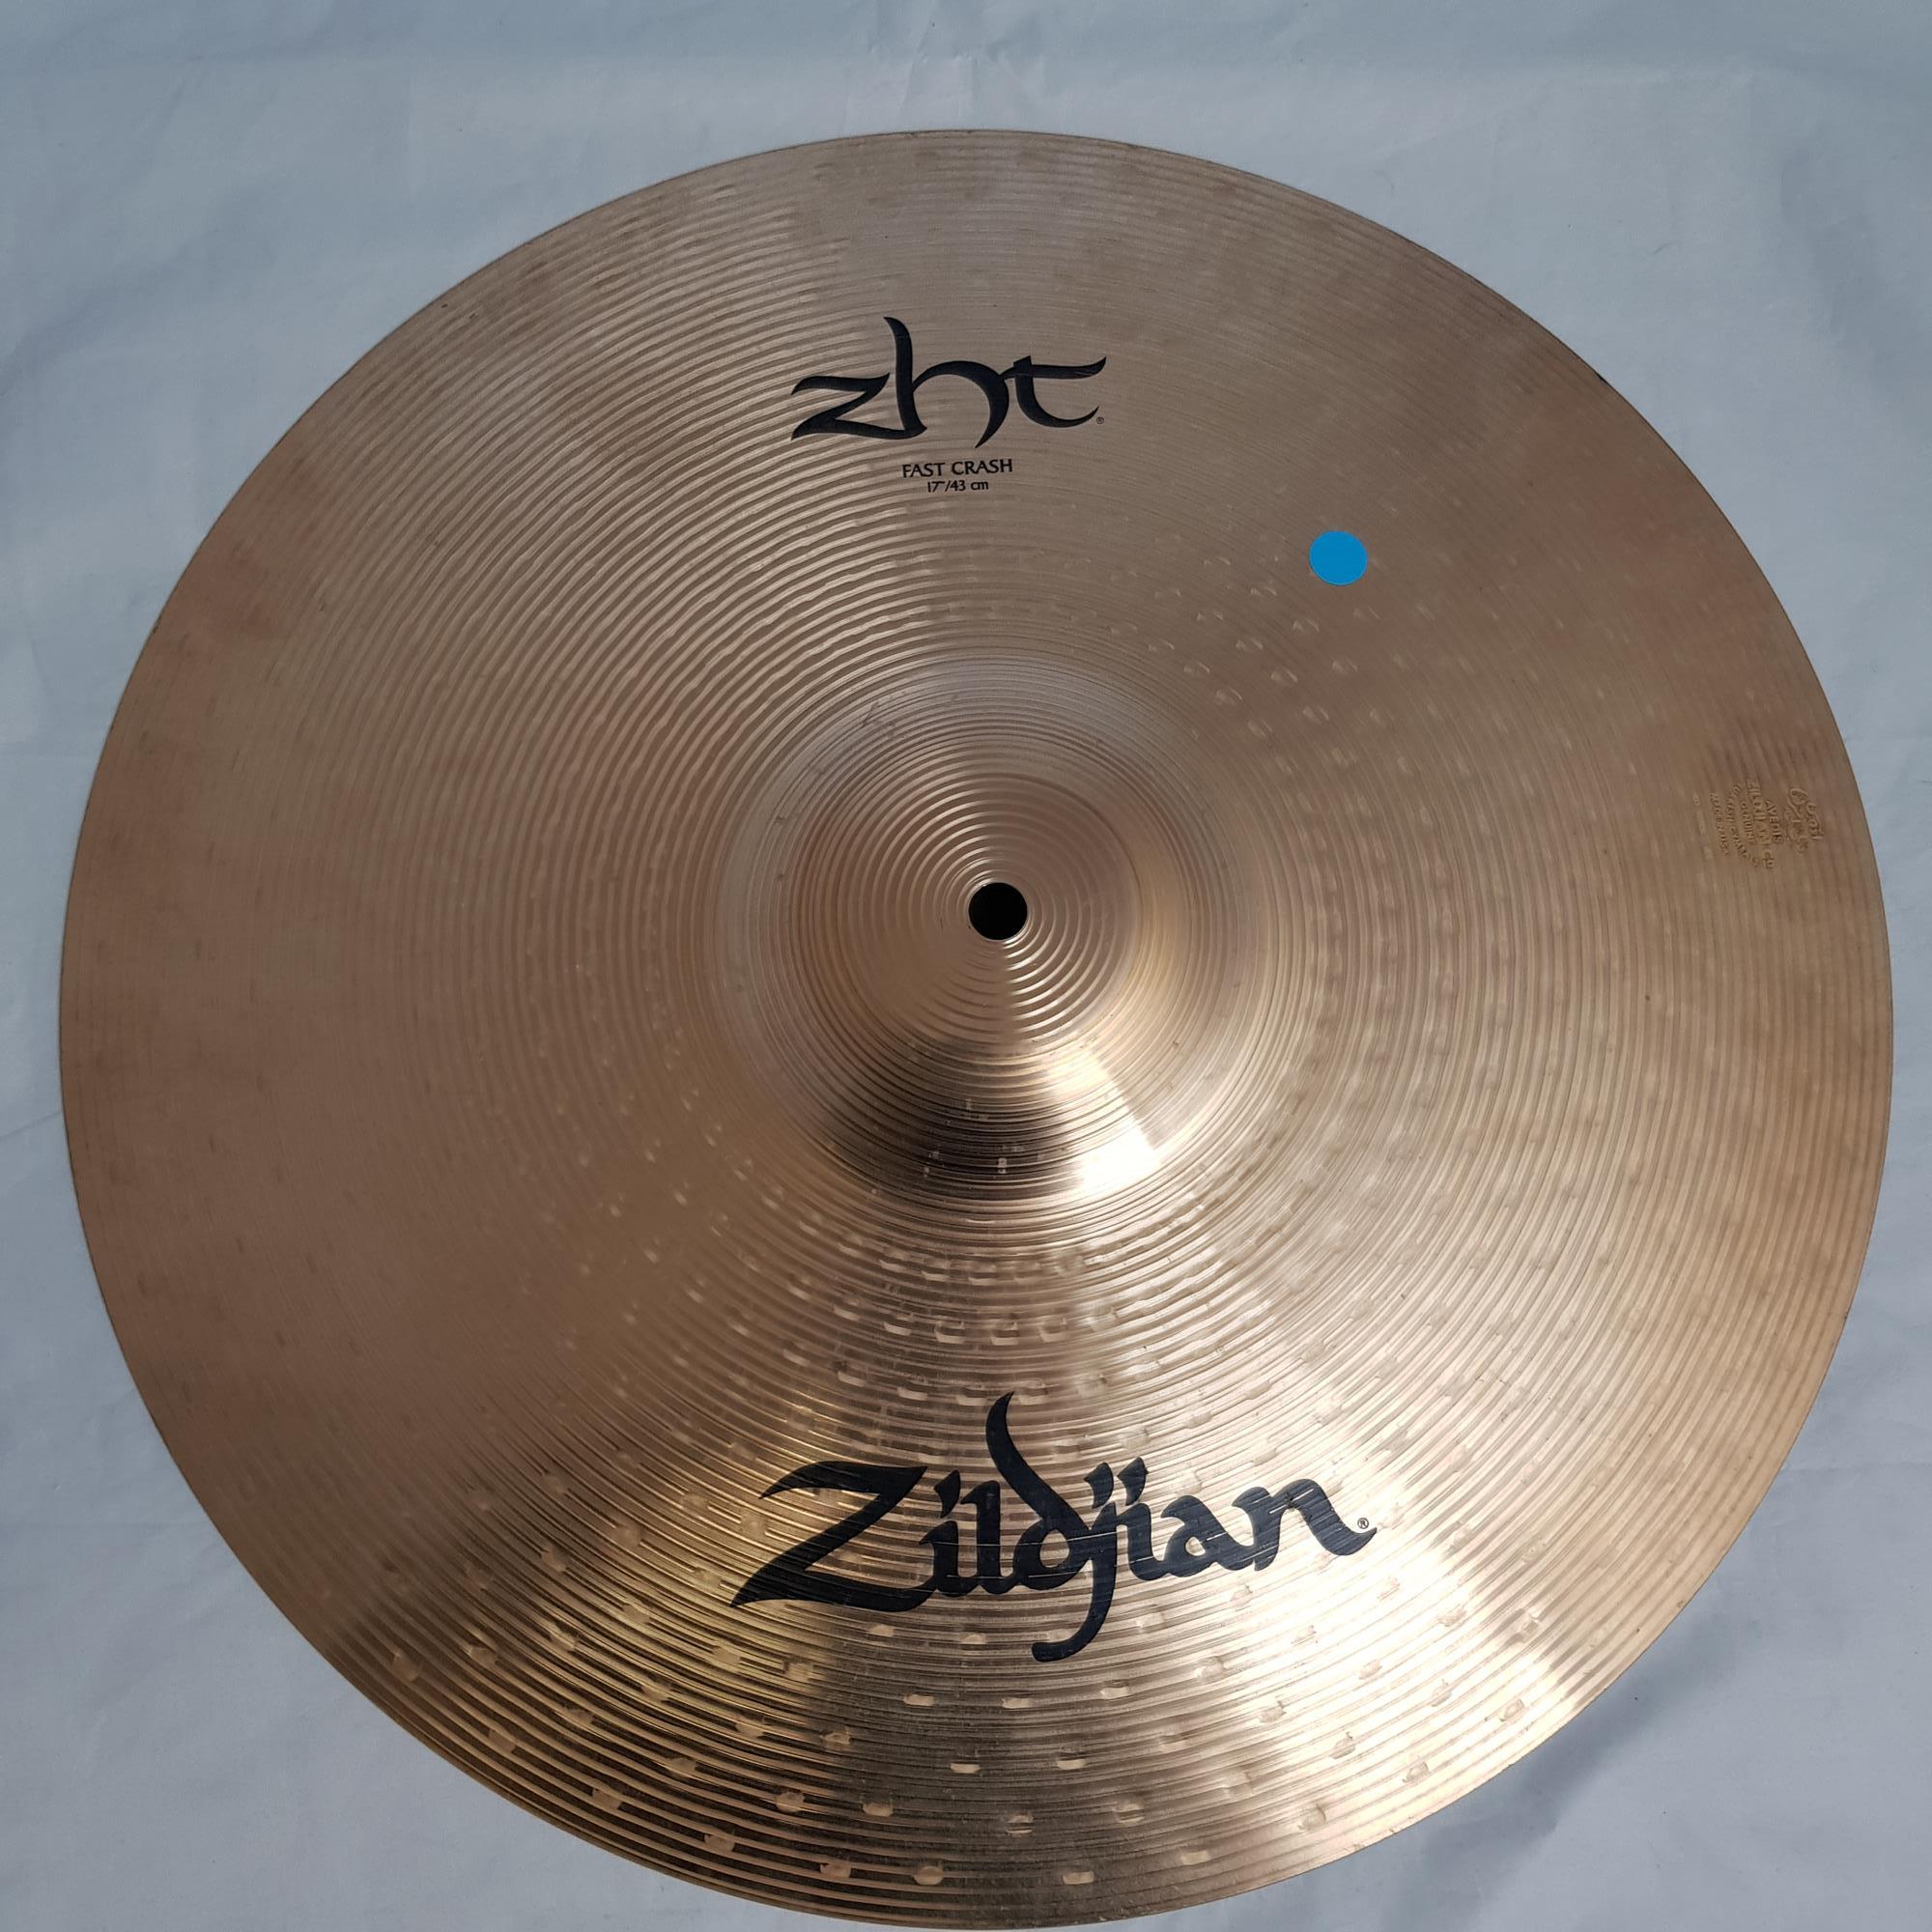 ZILDJIAN-ZHT-17-FAST-CRASH-sku-1631985673809